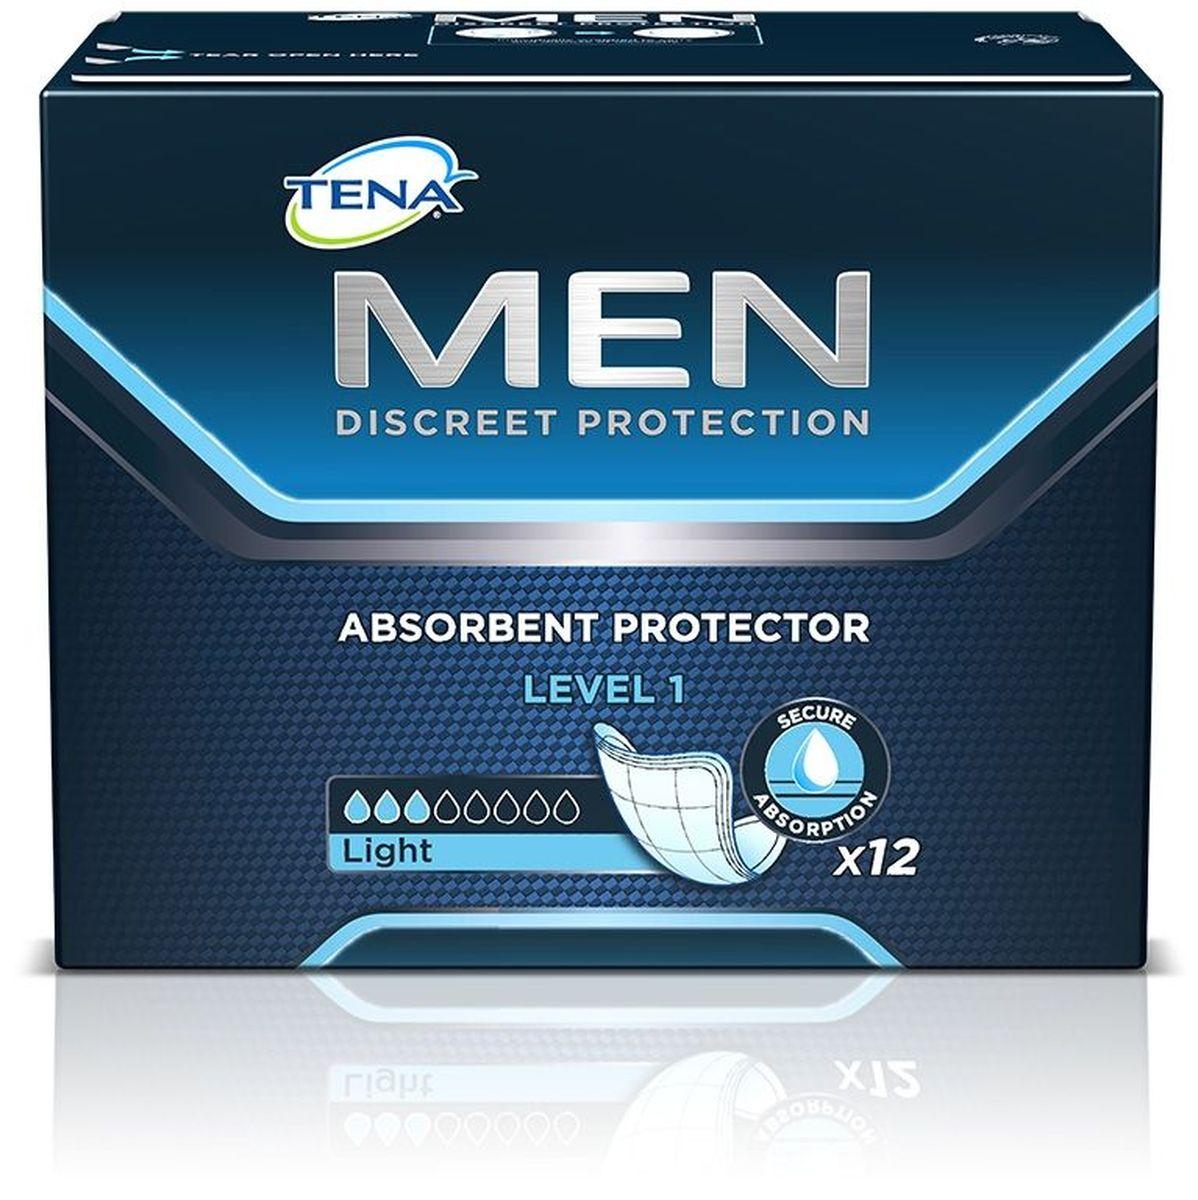 Tena Прокладки урологические для мужчин Men 1 12 шт tena on s string vol 4